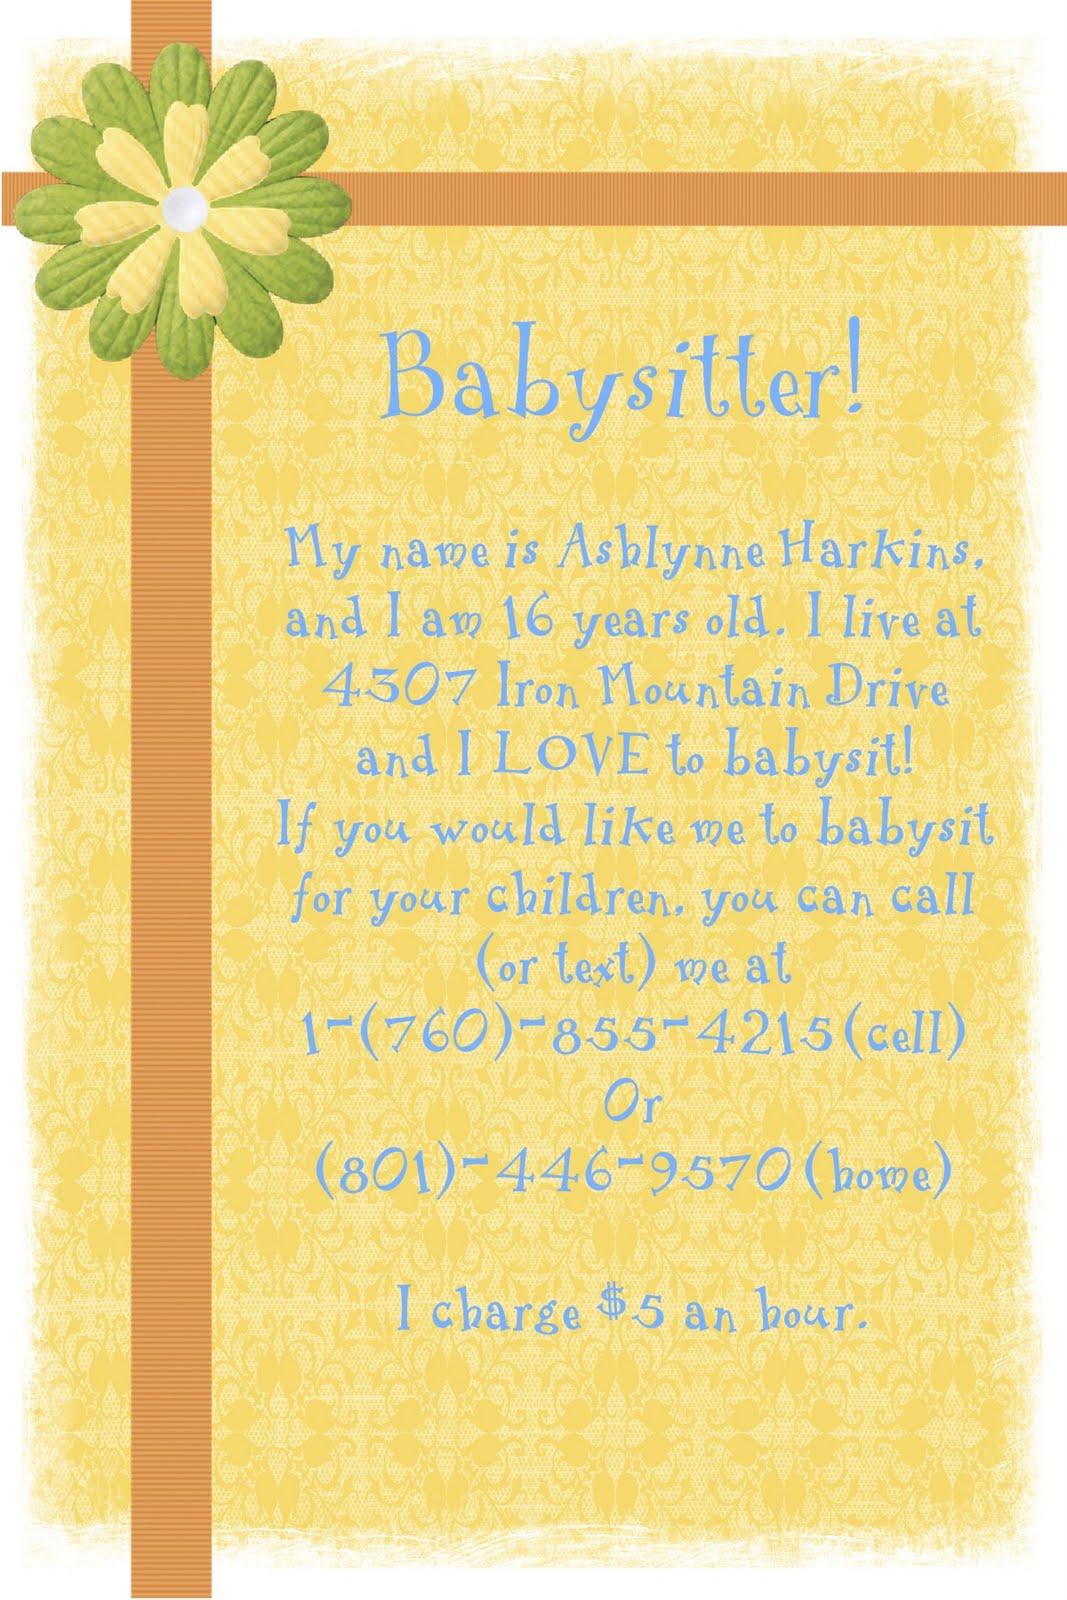 babysitting flier cf babysitting flyer template microsoft word